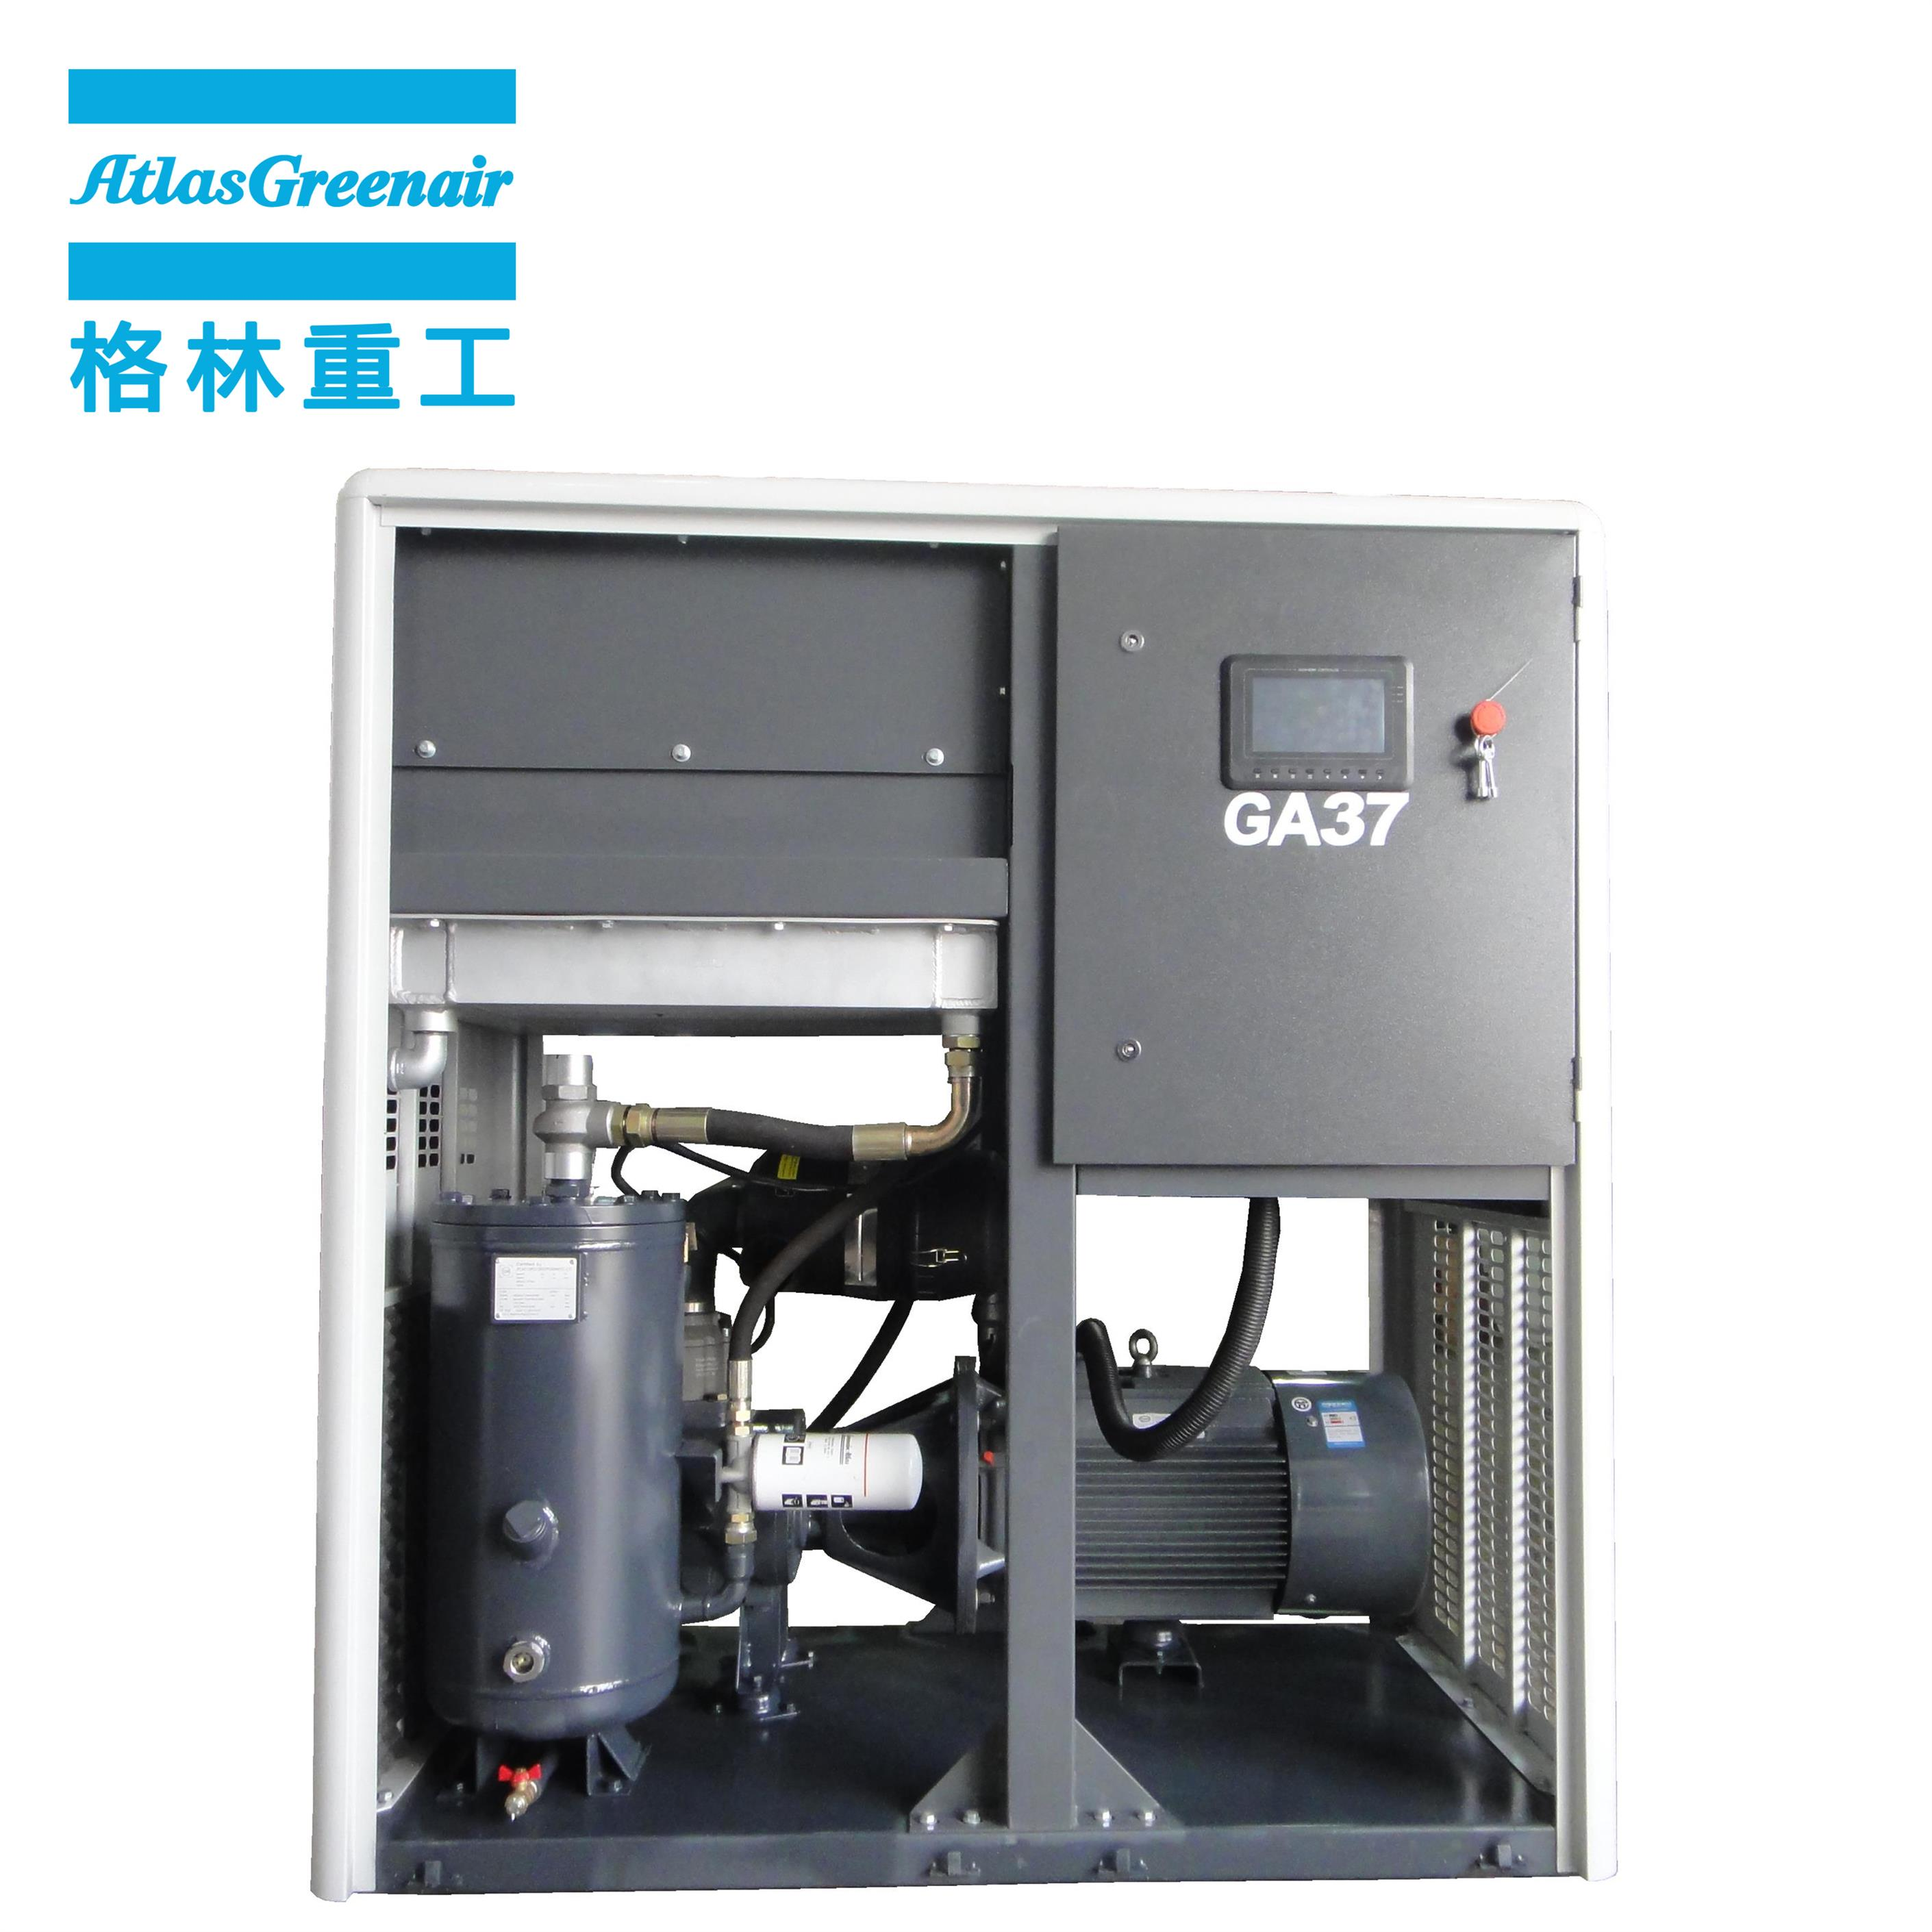 ga atlas copco screw compressor factory for tropical area-1